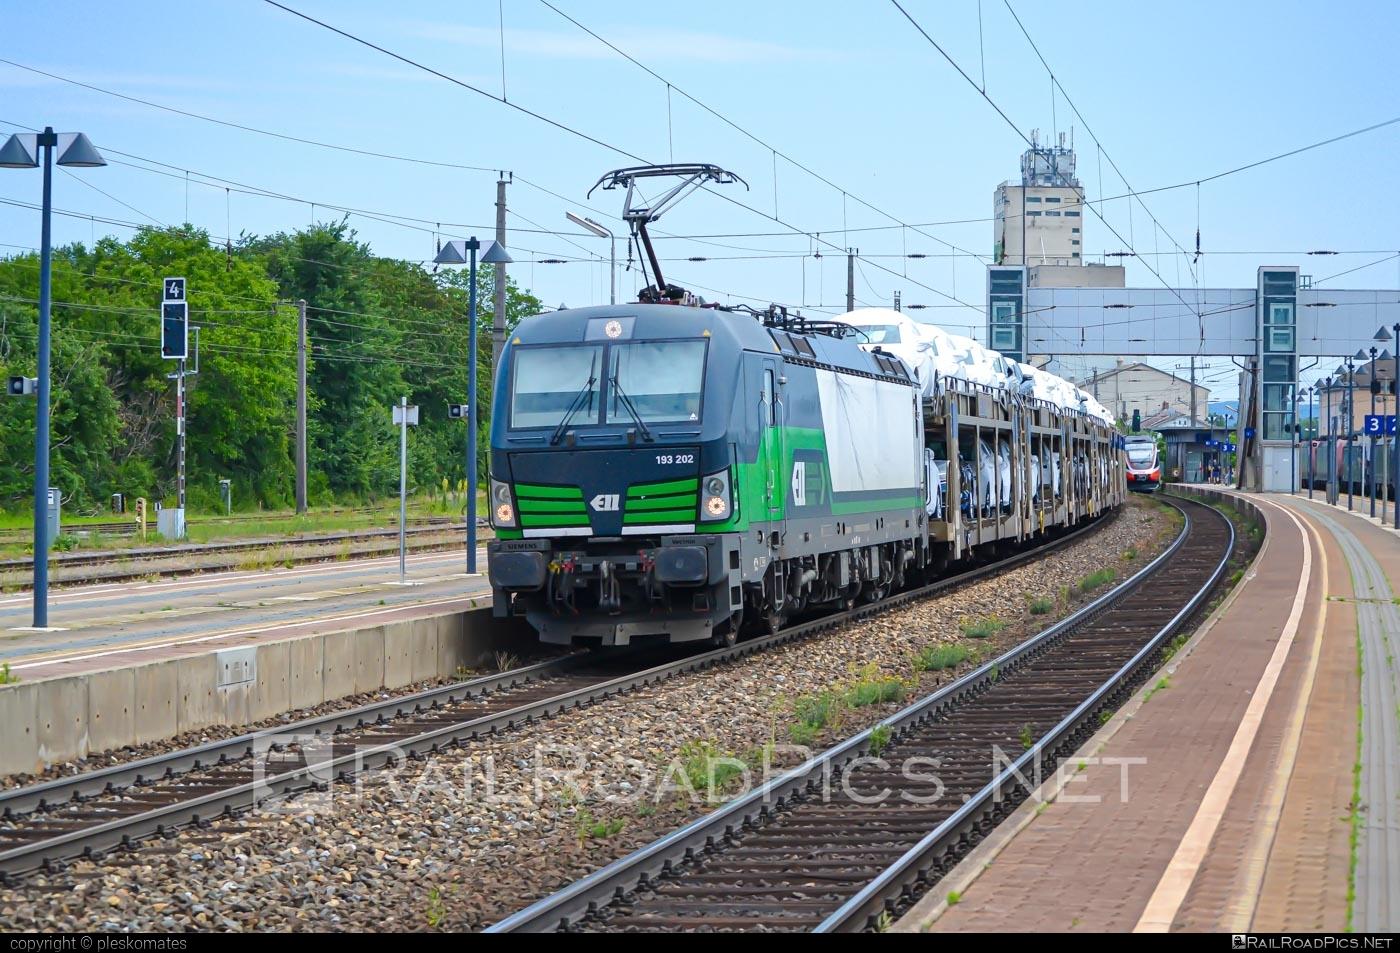 Siemens Vectron AC - 193 202-9 operated by ecco-rail GmbH #ecco-rail #eccorail #eccorailgmbh #ell #ellgermany #eloc #europeanlocomotiveleasing #siemens #siemensvectron #siemensvectronac #vectron #vectronac